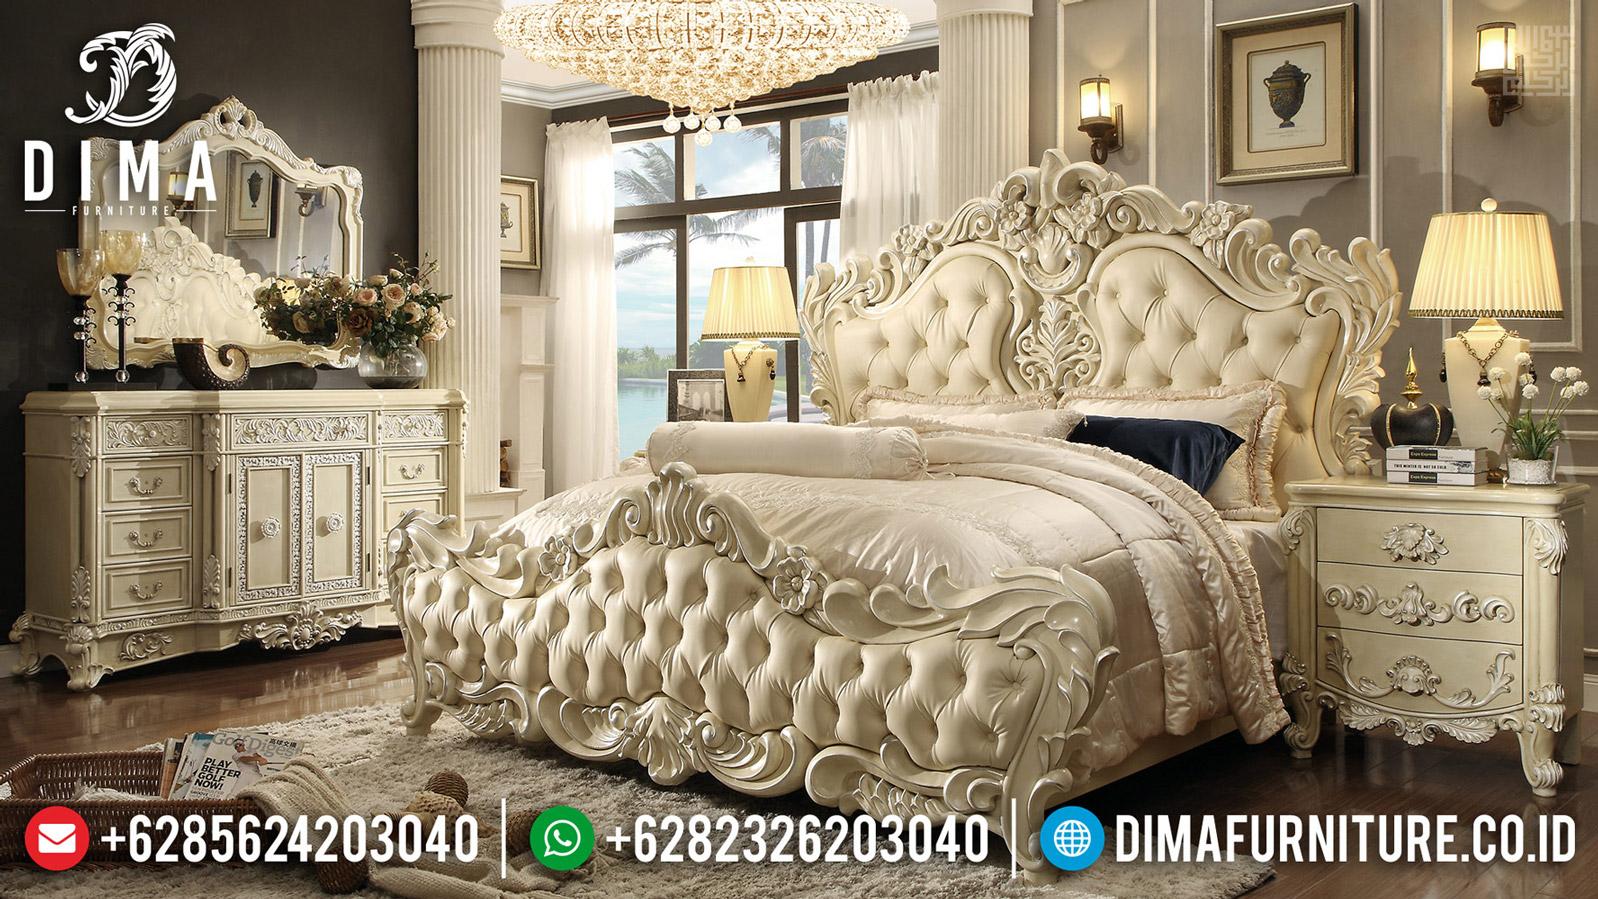 Room Vanity Set Kamar Mewah Jepara Luxury Classic Ukiran Artistik MMJ-0569